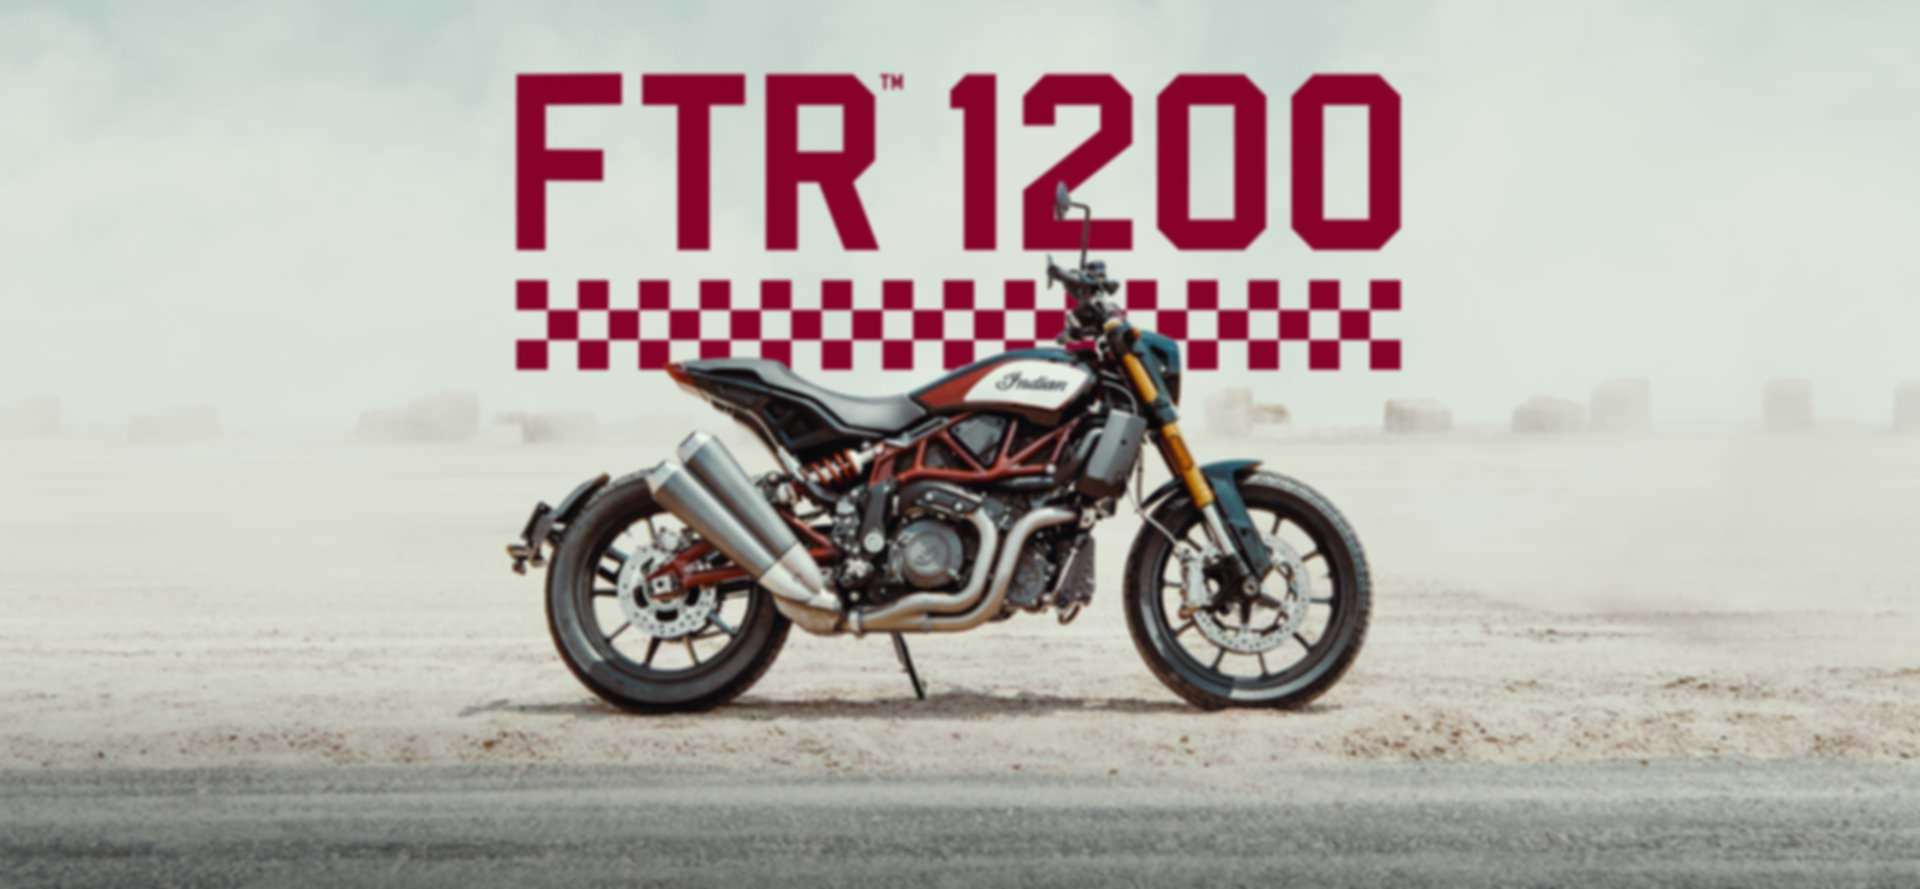 Custom Parts FTR 1200